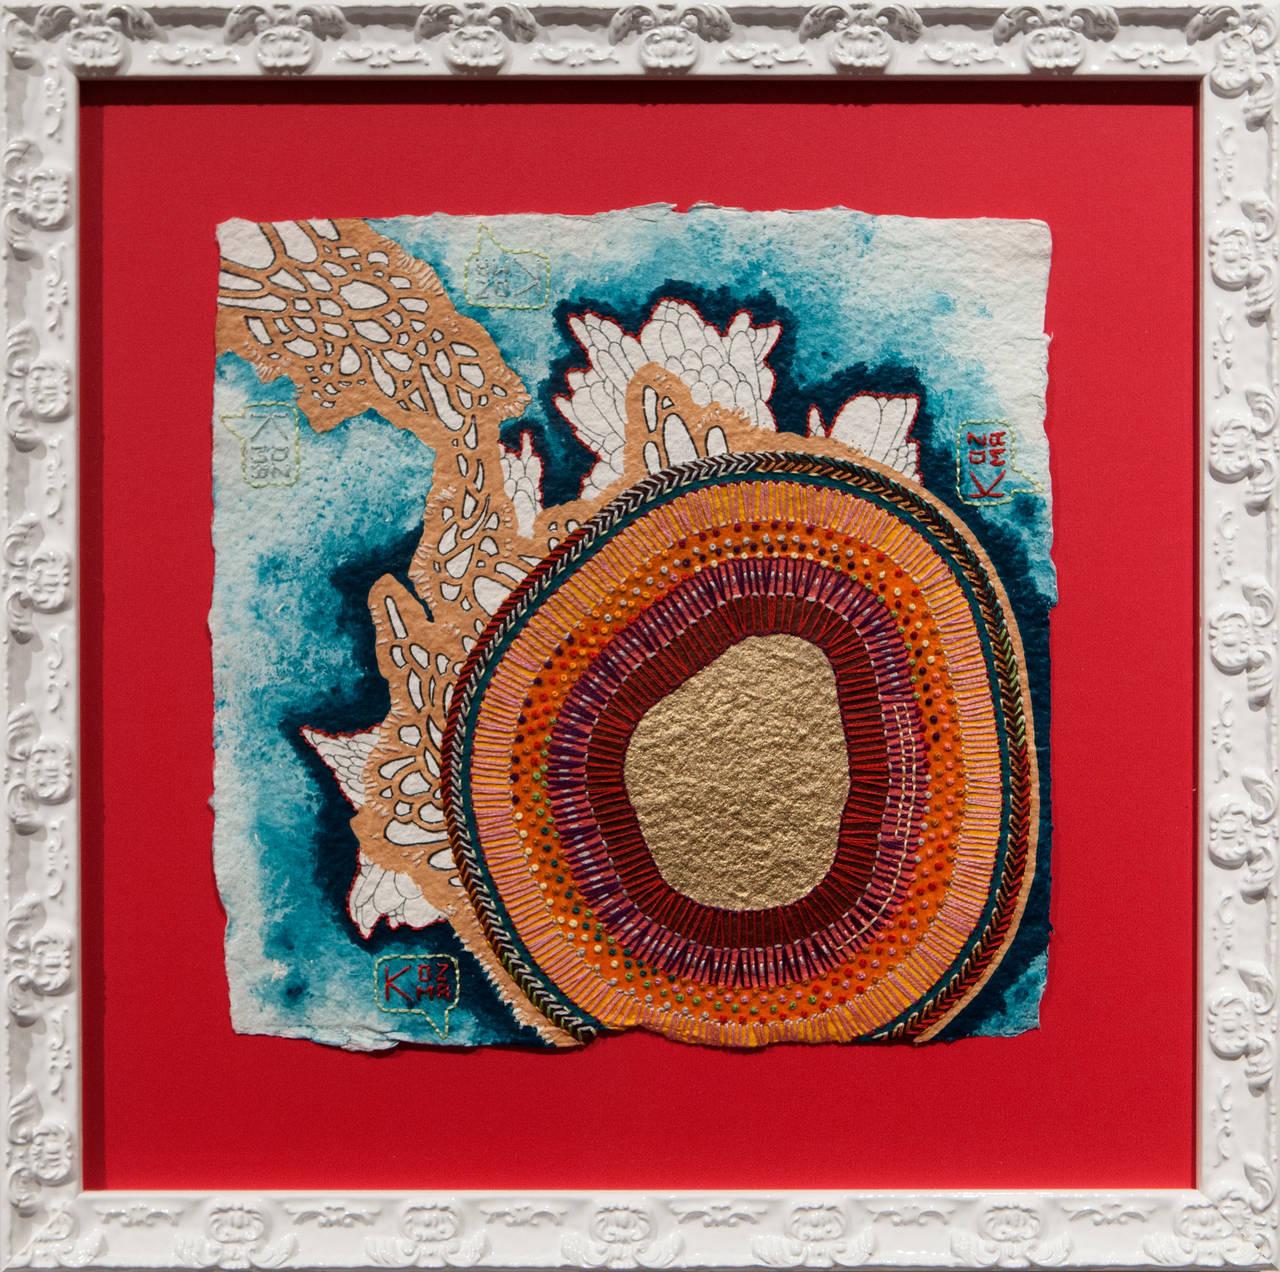 """Rosy"", original mixed media embroidery"